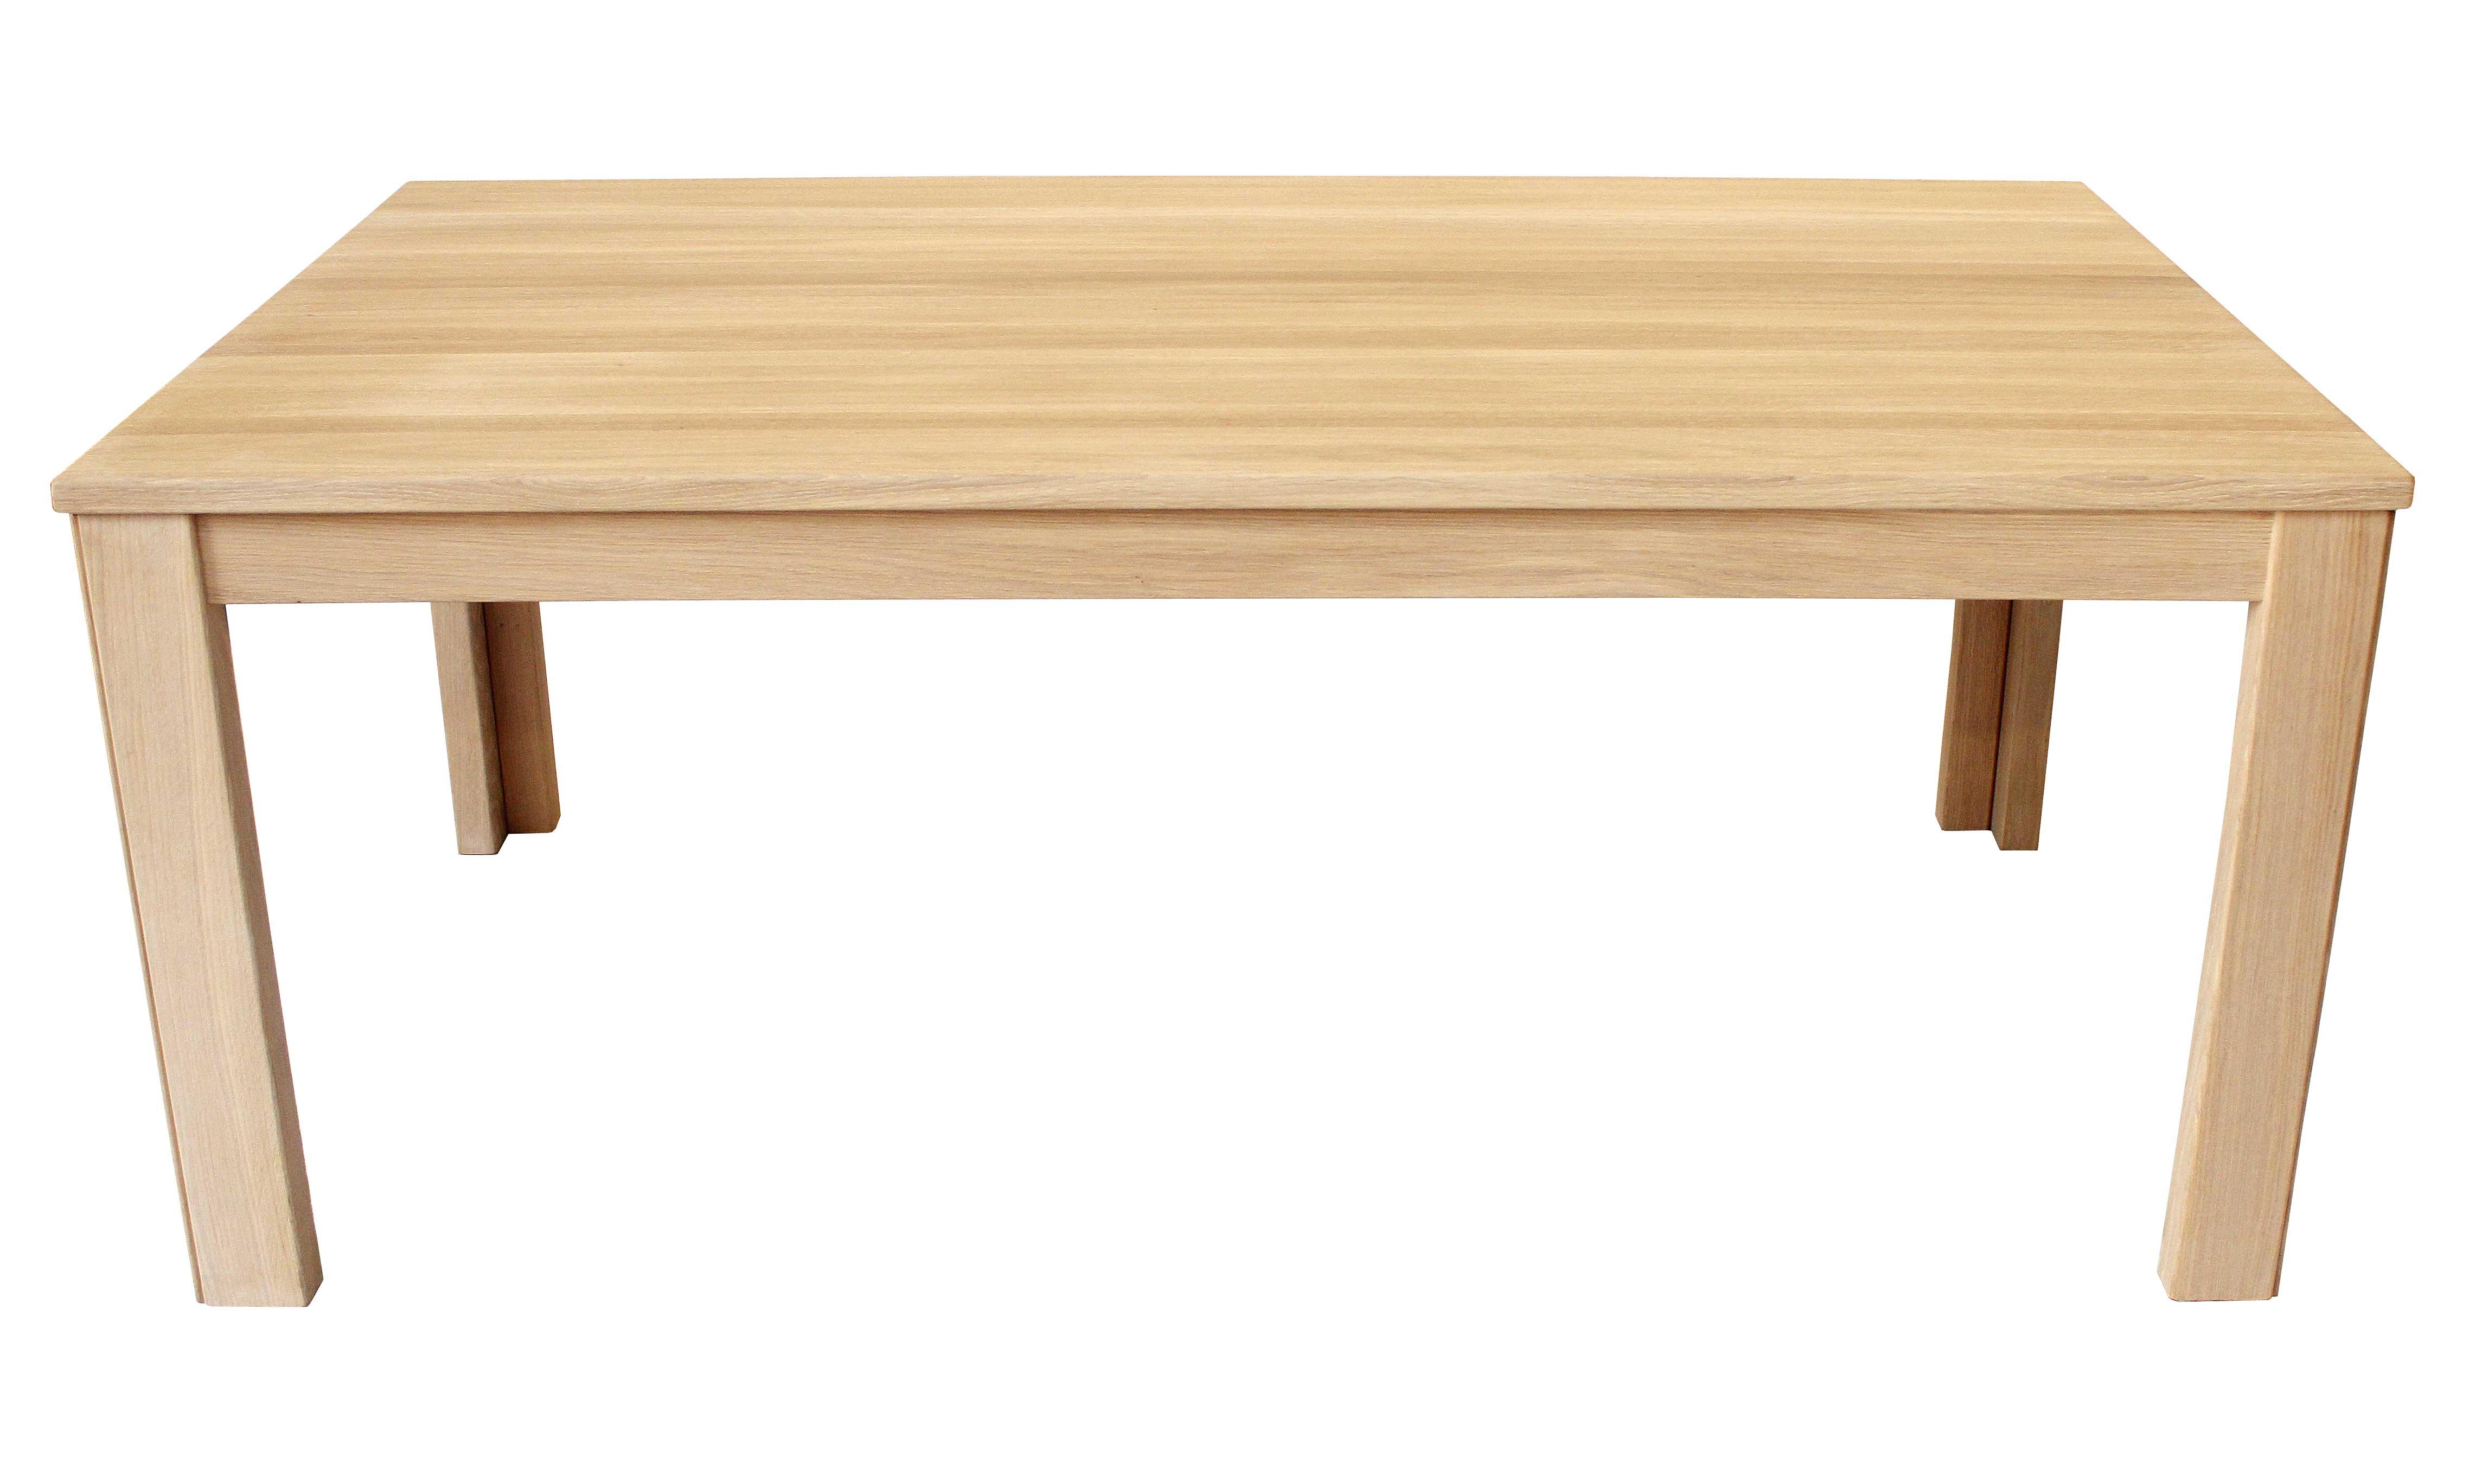 Design Spisebord. Design Spisebord With Design Spisebord. Best ...